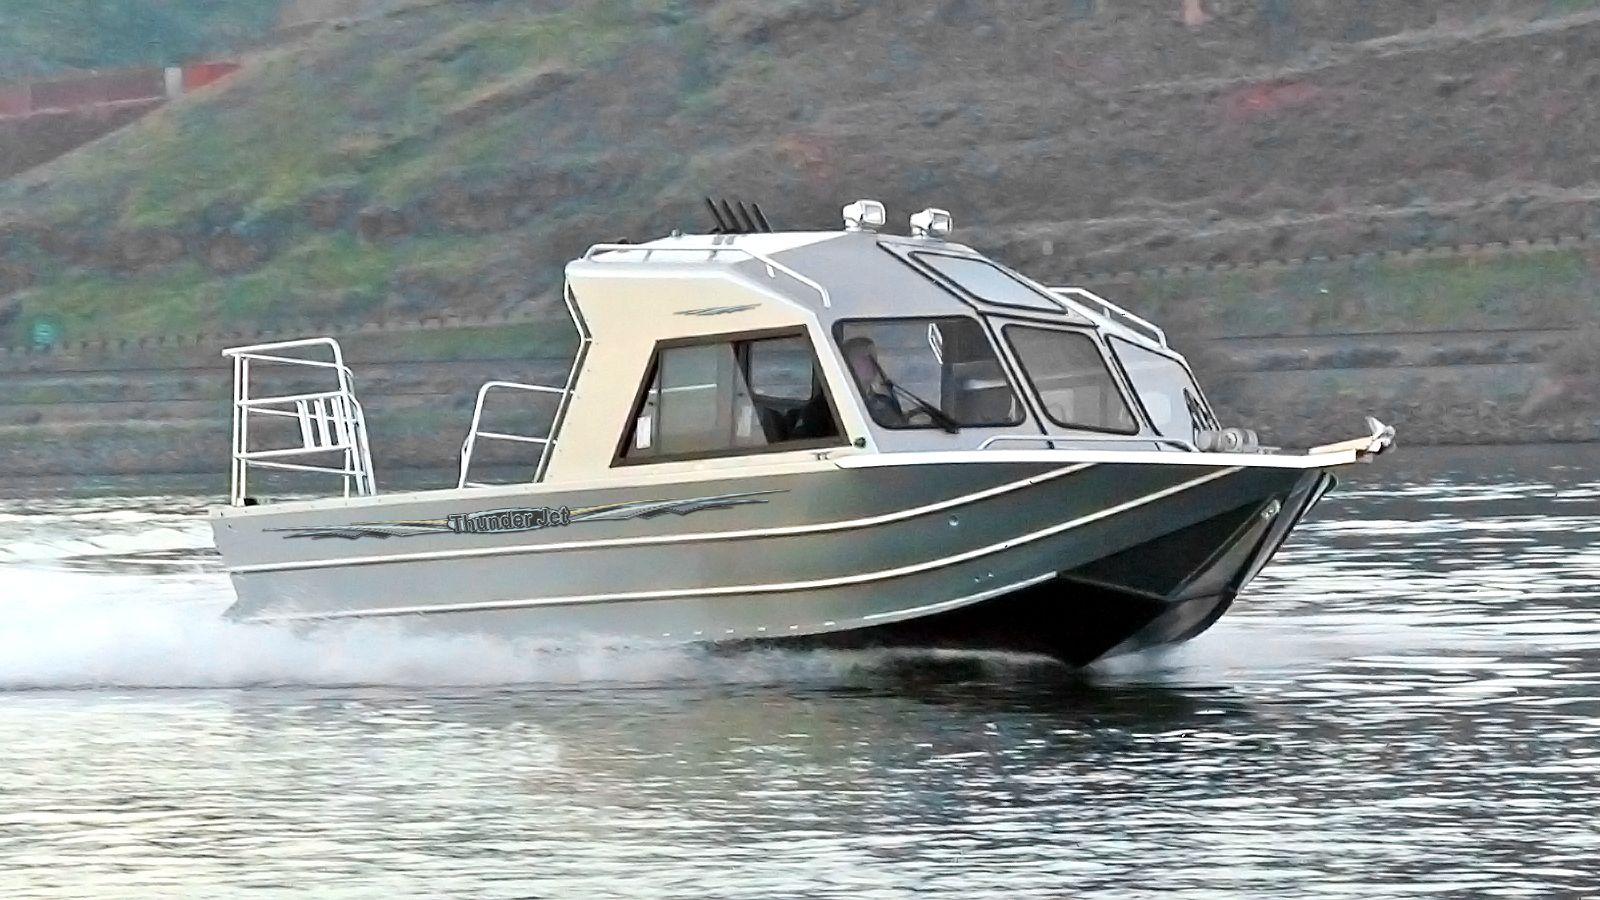 Maxim Classic | Aluminum Boat Manufacturer - Thunder Jet | Diamond